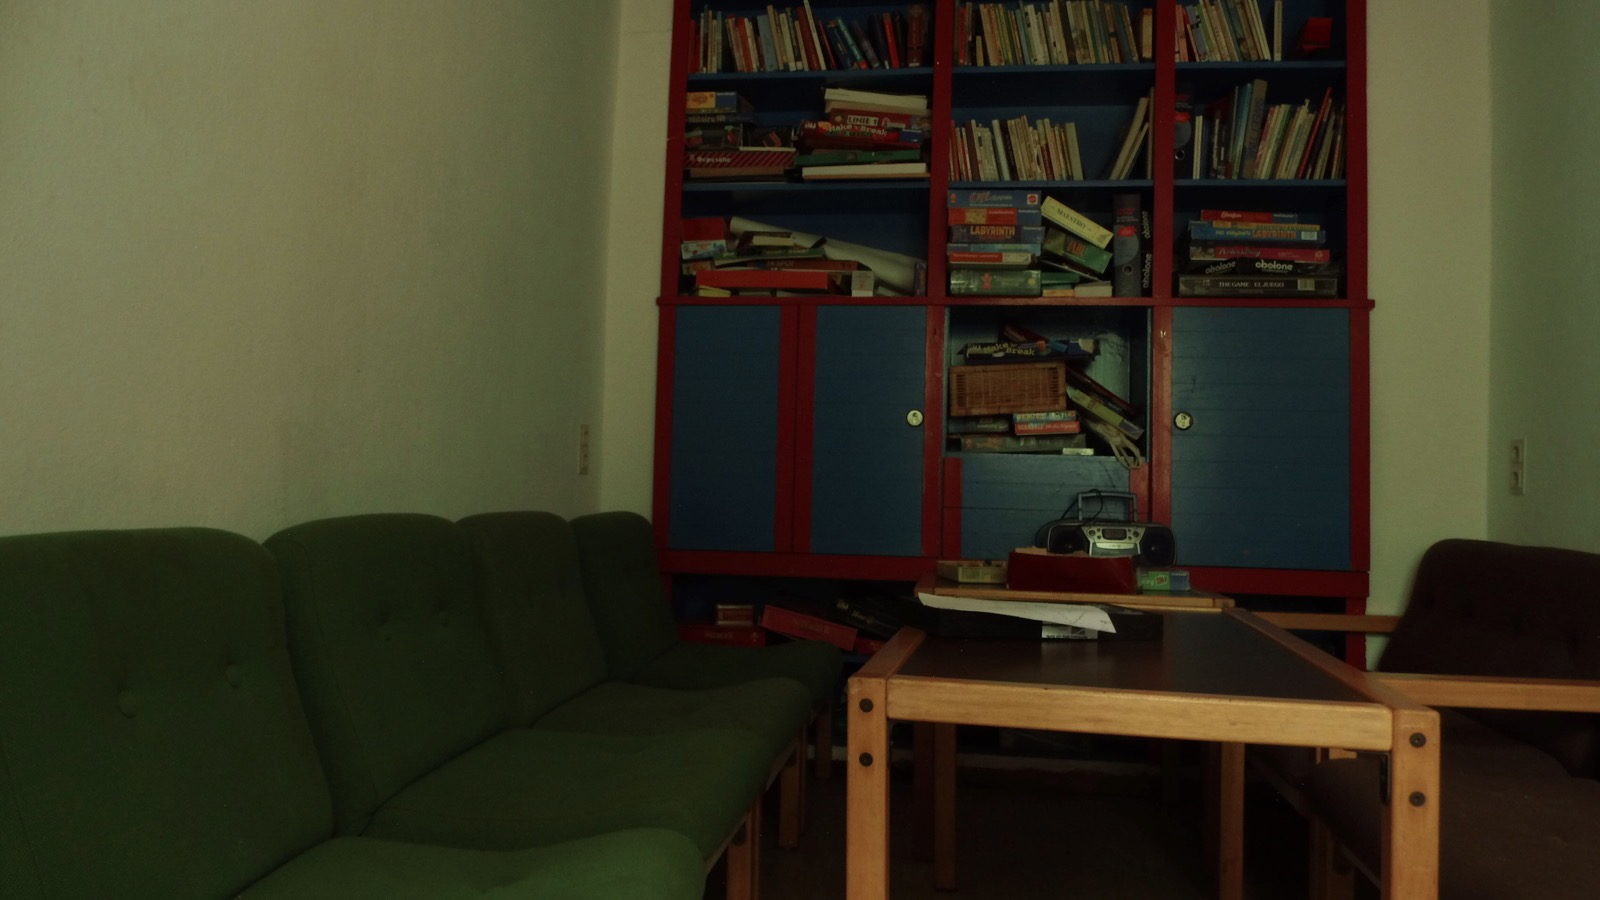 Bibliothek_16zu9